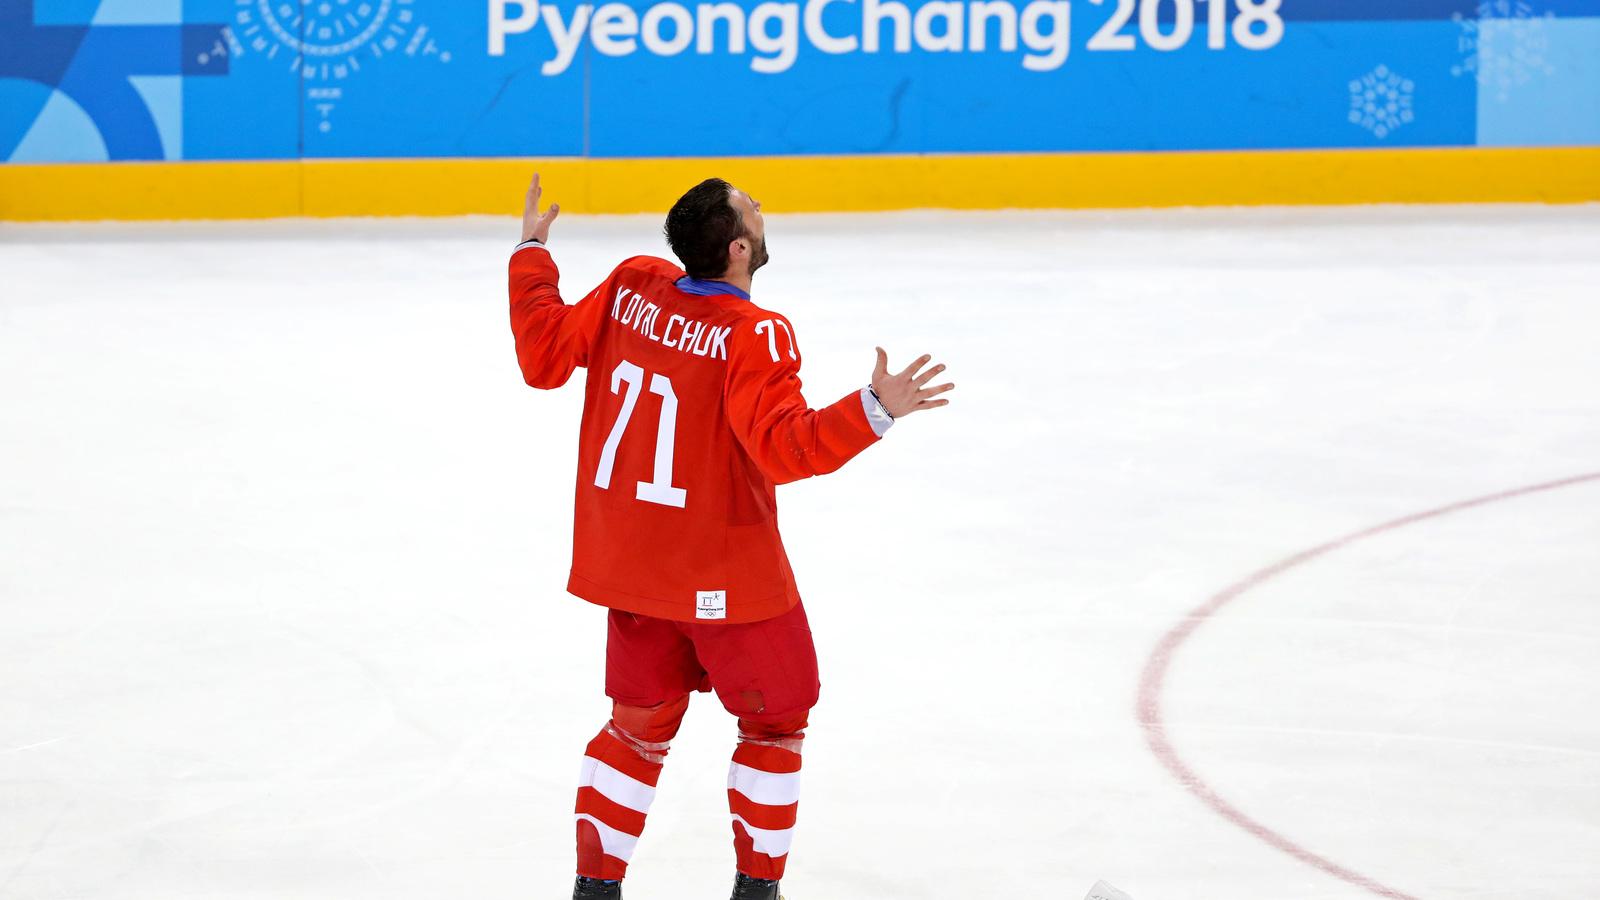 Ilya Kovalchuk can begin talking to NHL teams on April 15